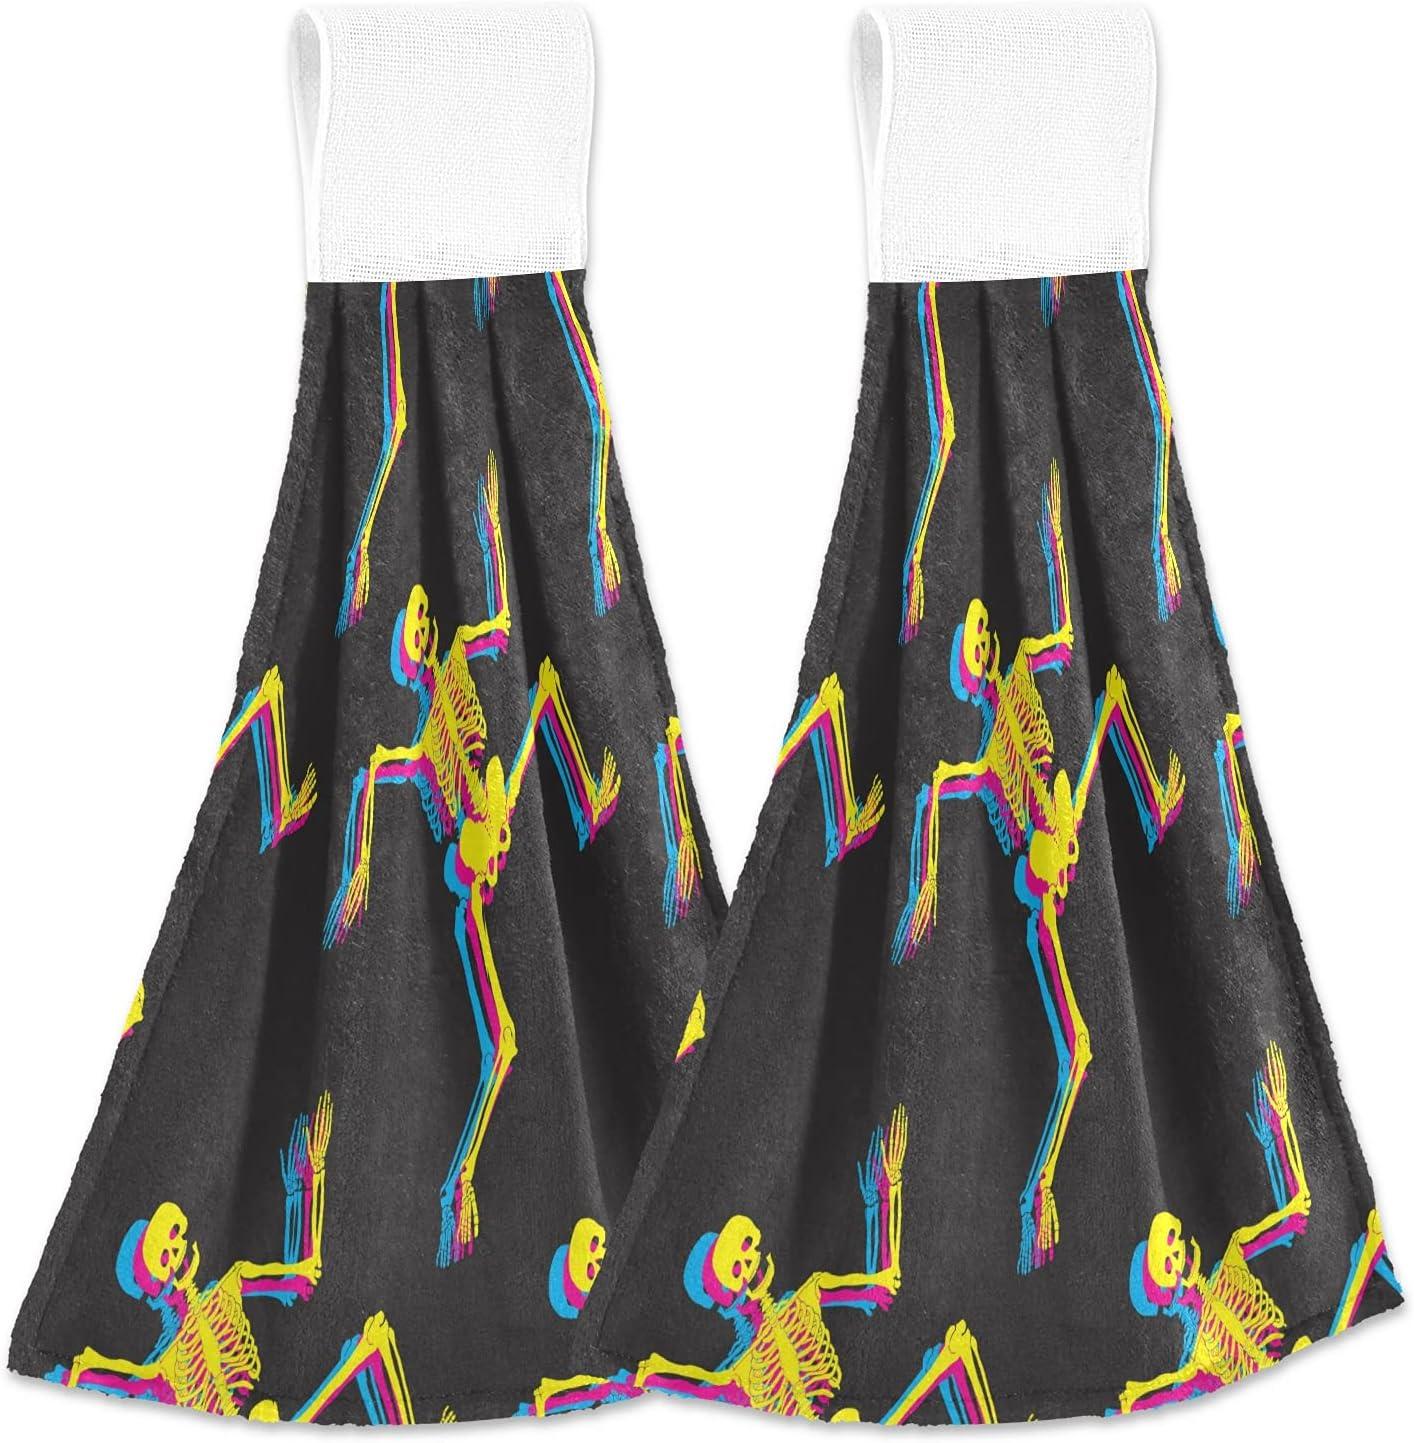 Dancing Skeletons Pattern Hanging Kitchen Towels Bathroom 25% OFF Hand Super Special SALE held T